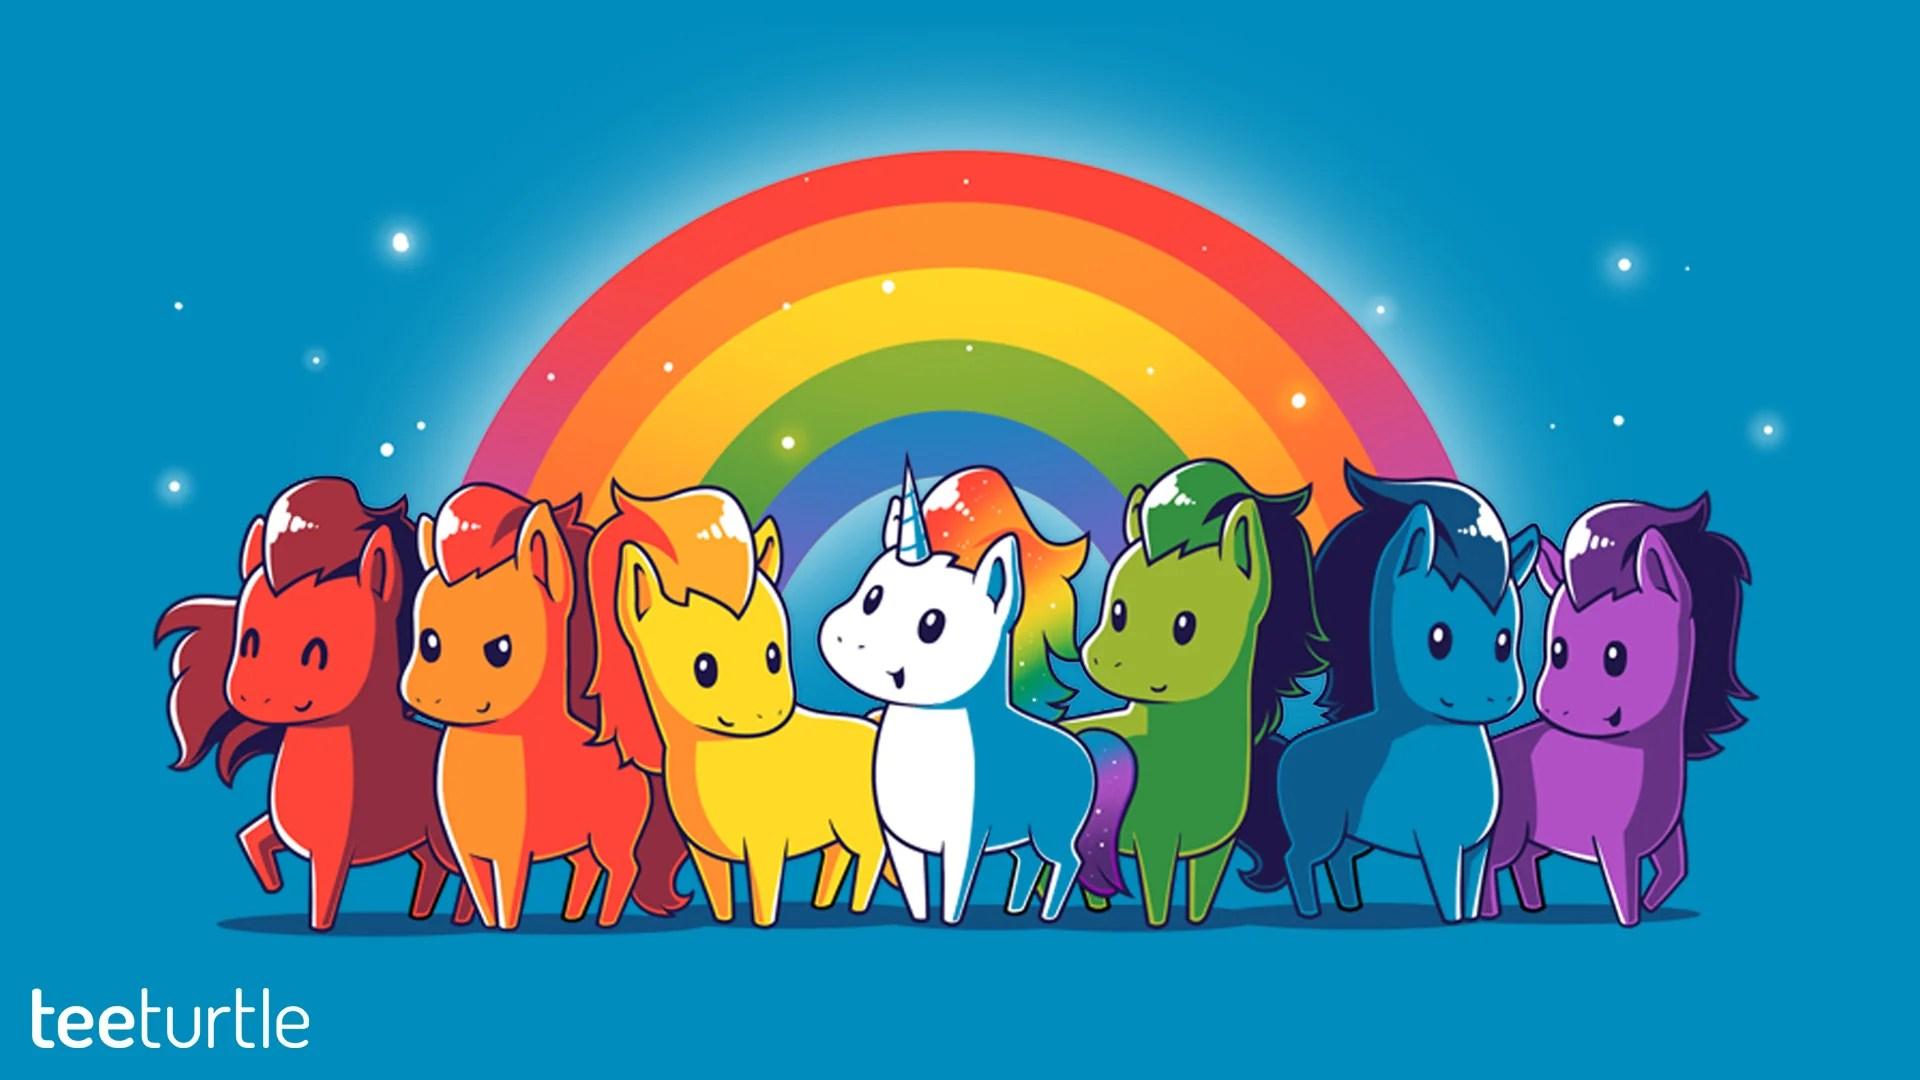 Cute Cartoon Unicorn Wallpapers Desktop Wallpapers Teeturtle